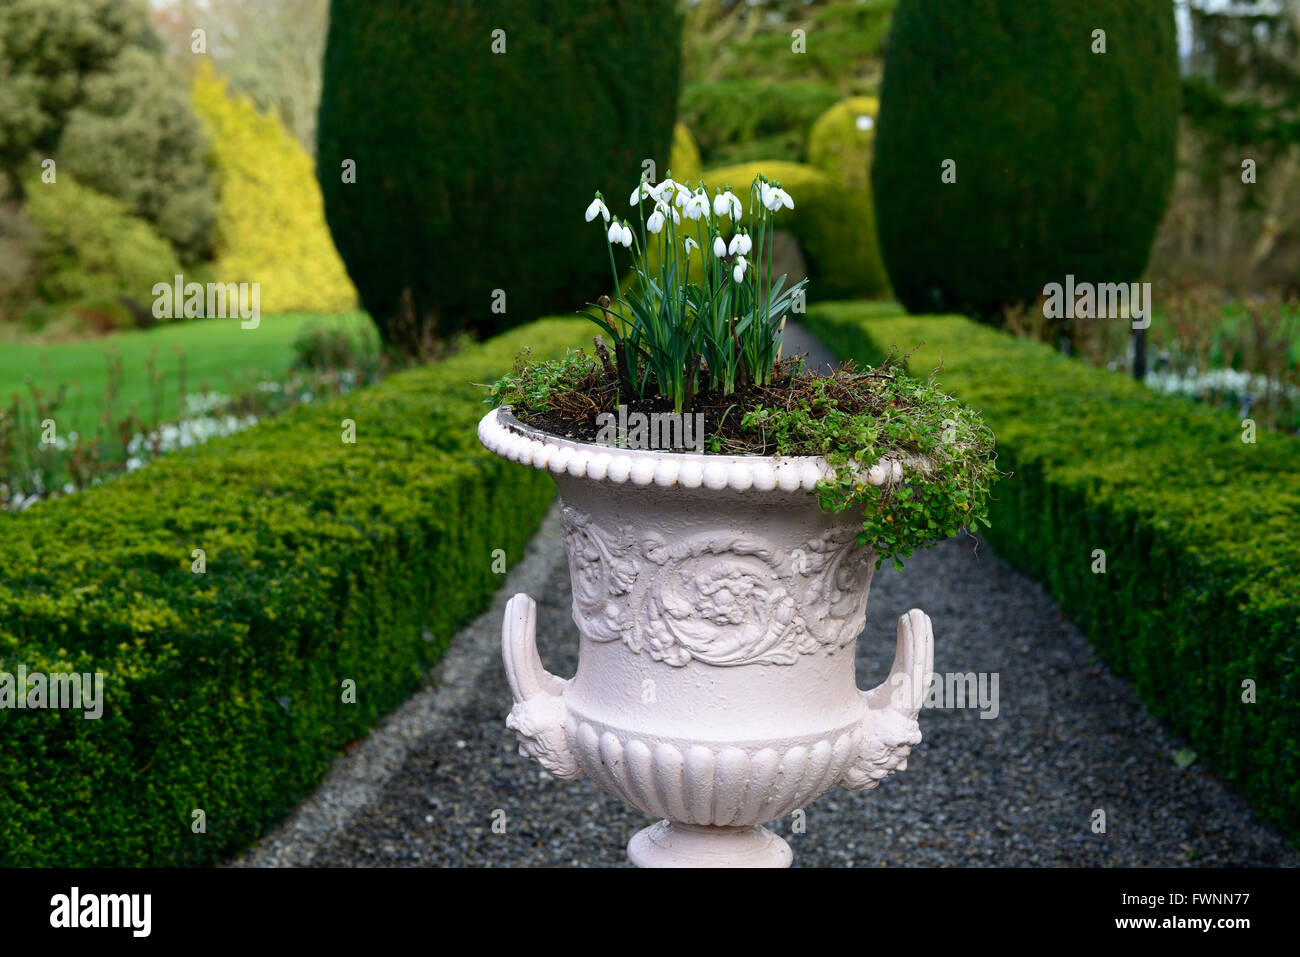 galanthus snowdrop planting urn pot decorative planter scheme Altamont gardens Carlow gardening RM Floral - Stock Image